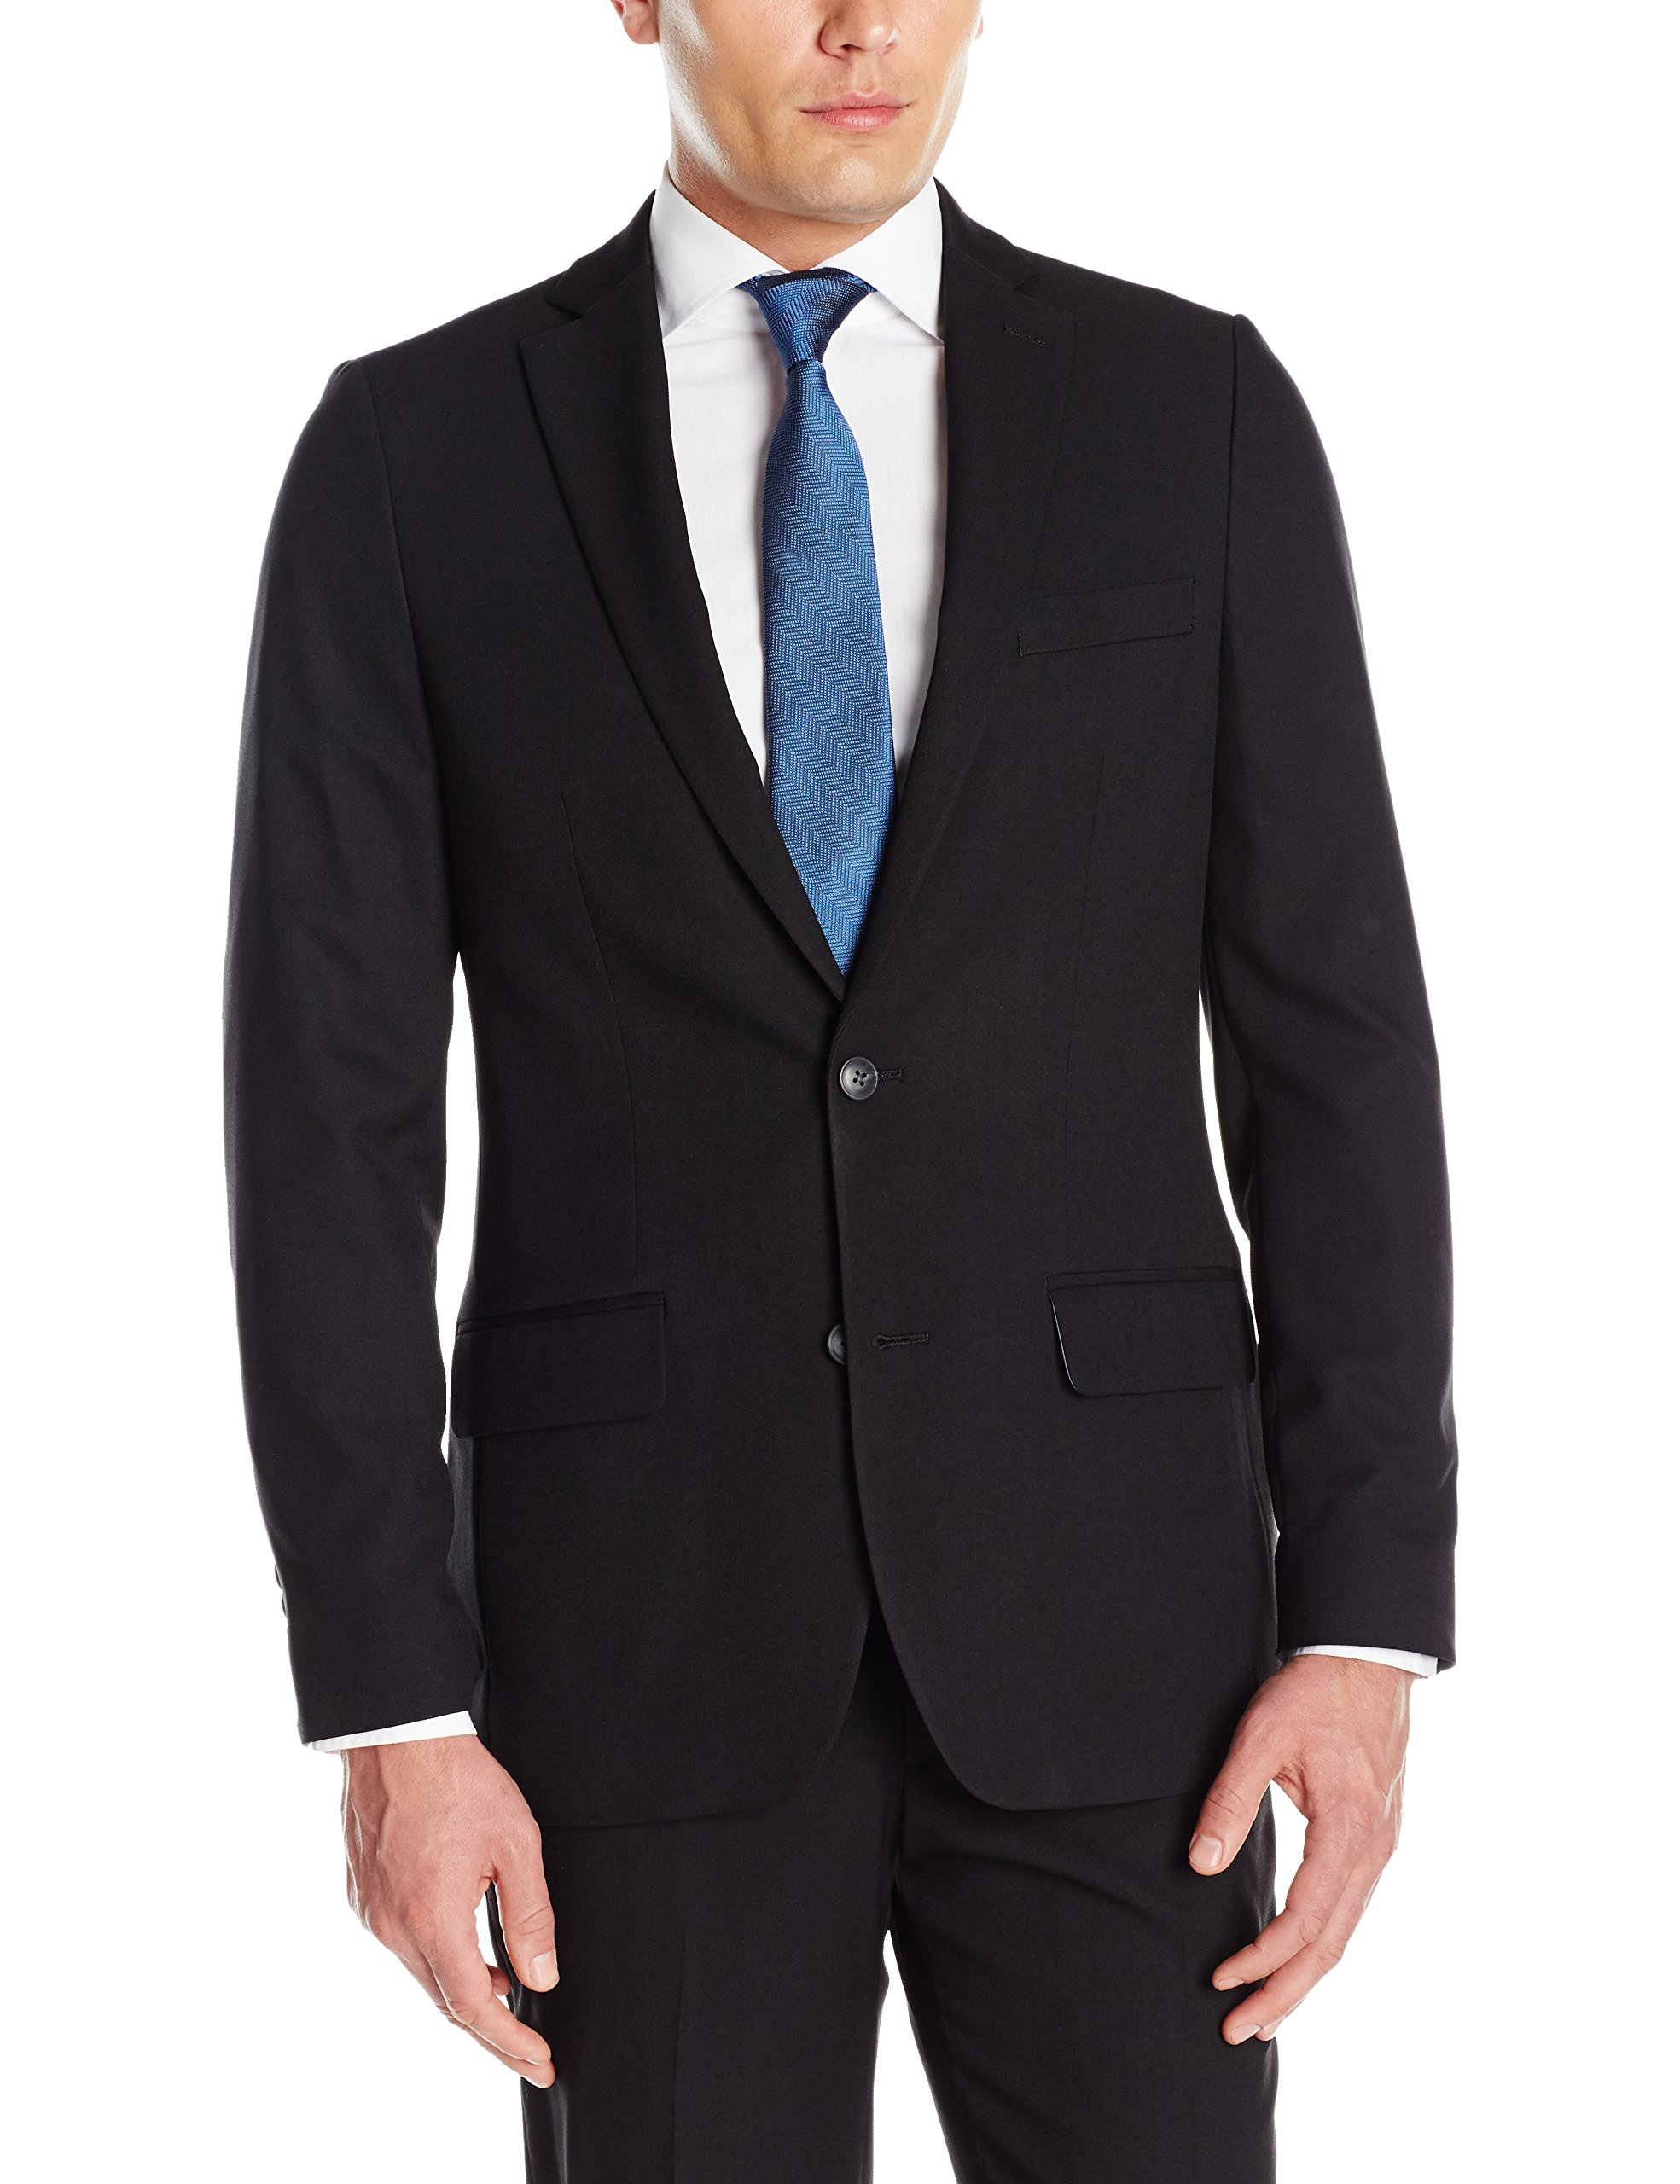 Haggar Men's Stretch Gab Slim Fit 2-Button Suit Separate Coat, Black, 36R by Haggar